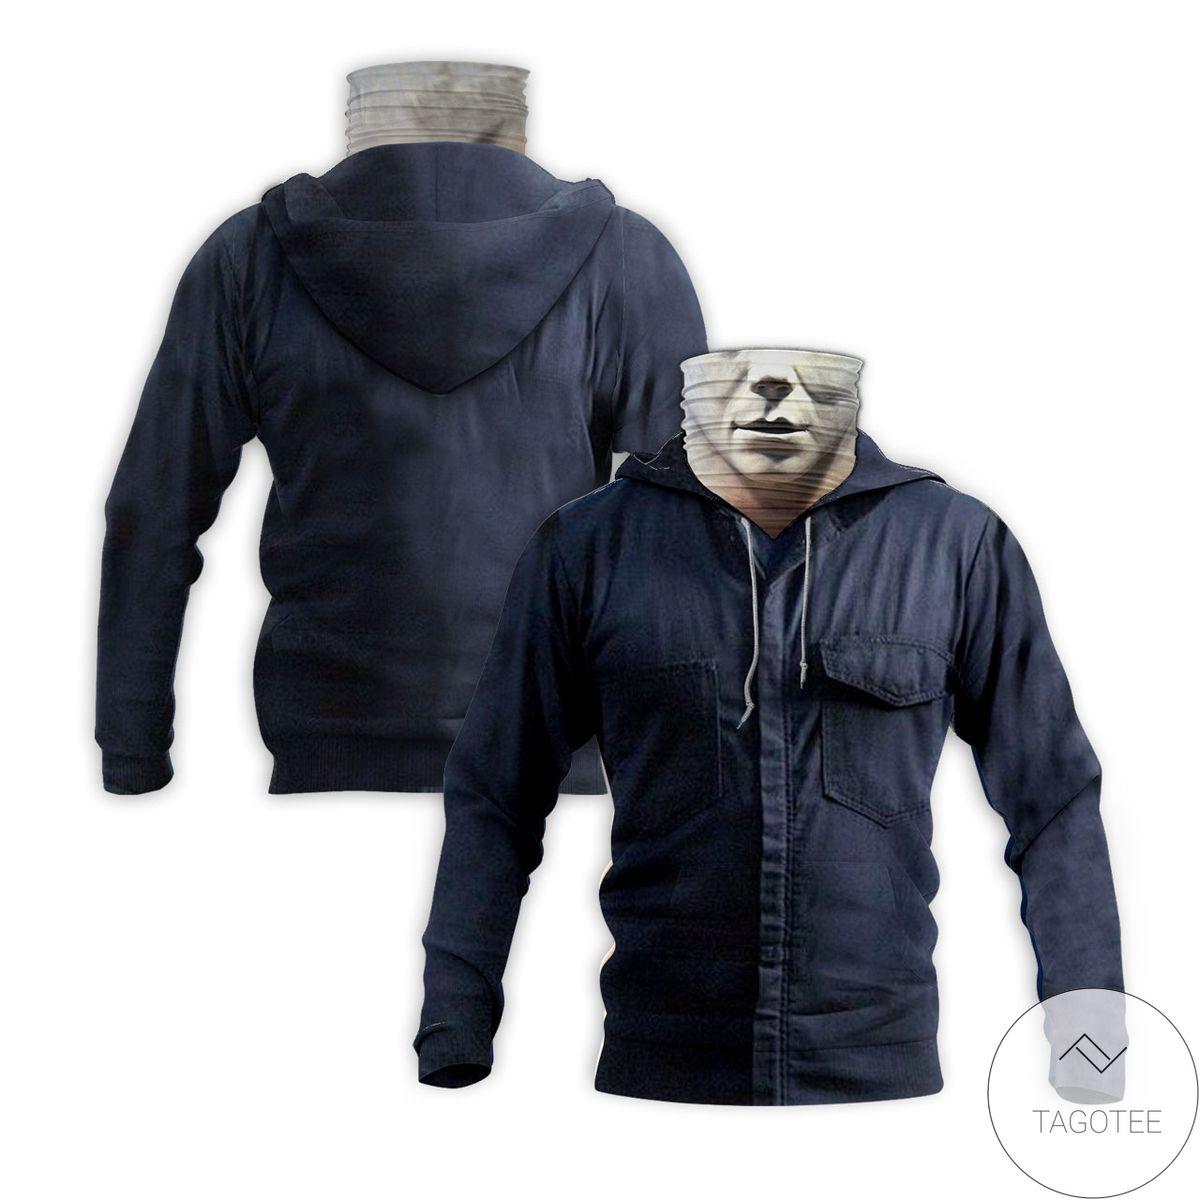 Handmade Michael Myers Horror Movie Halloween Mask Hoodie